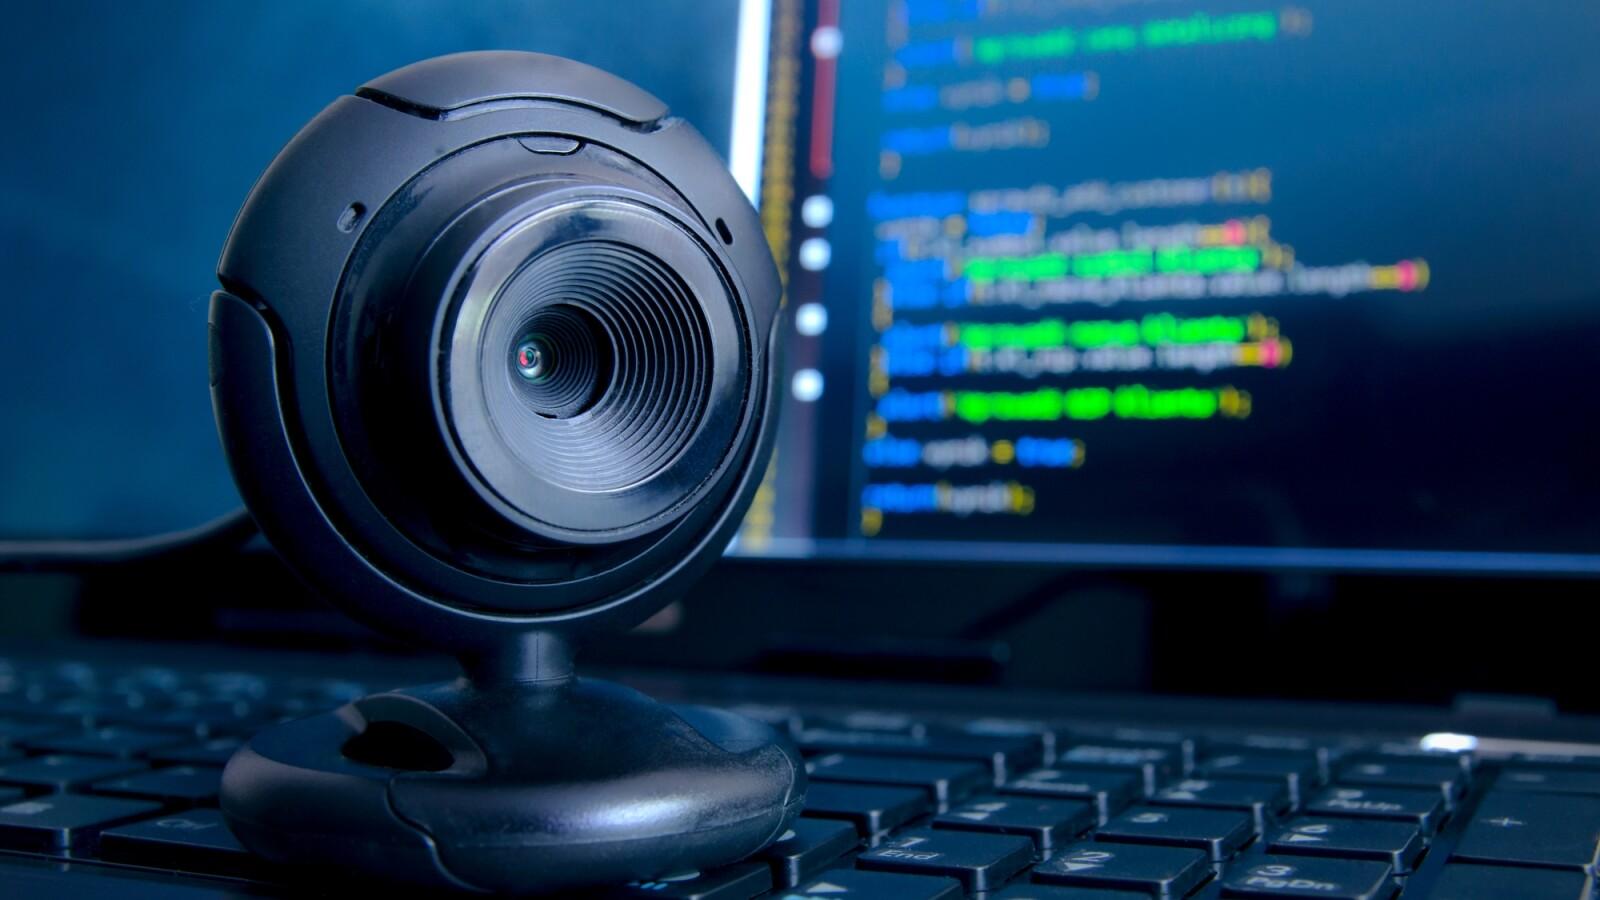 Disappearing People: Dieses Programm macht euch für Webcams unsichtbar